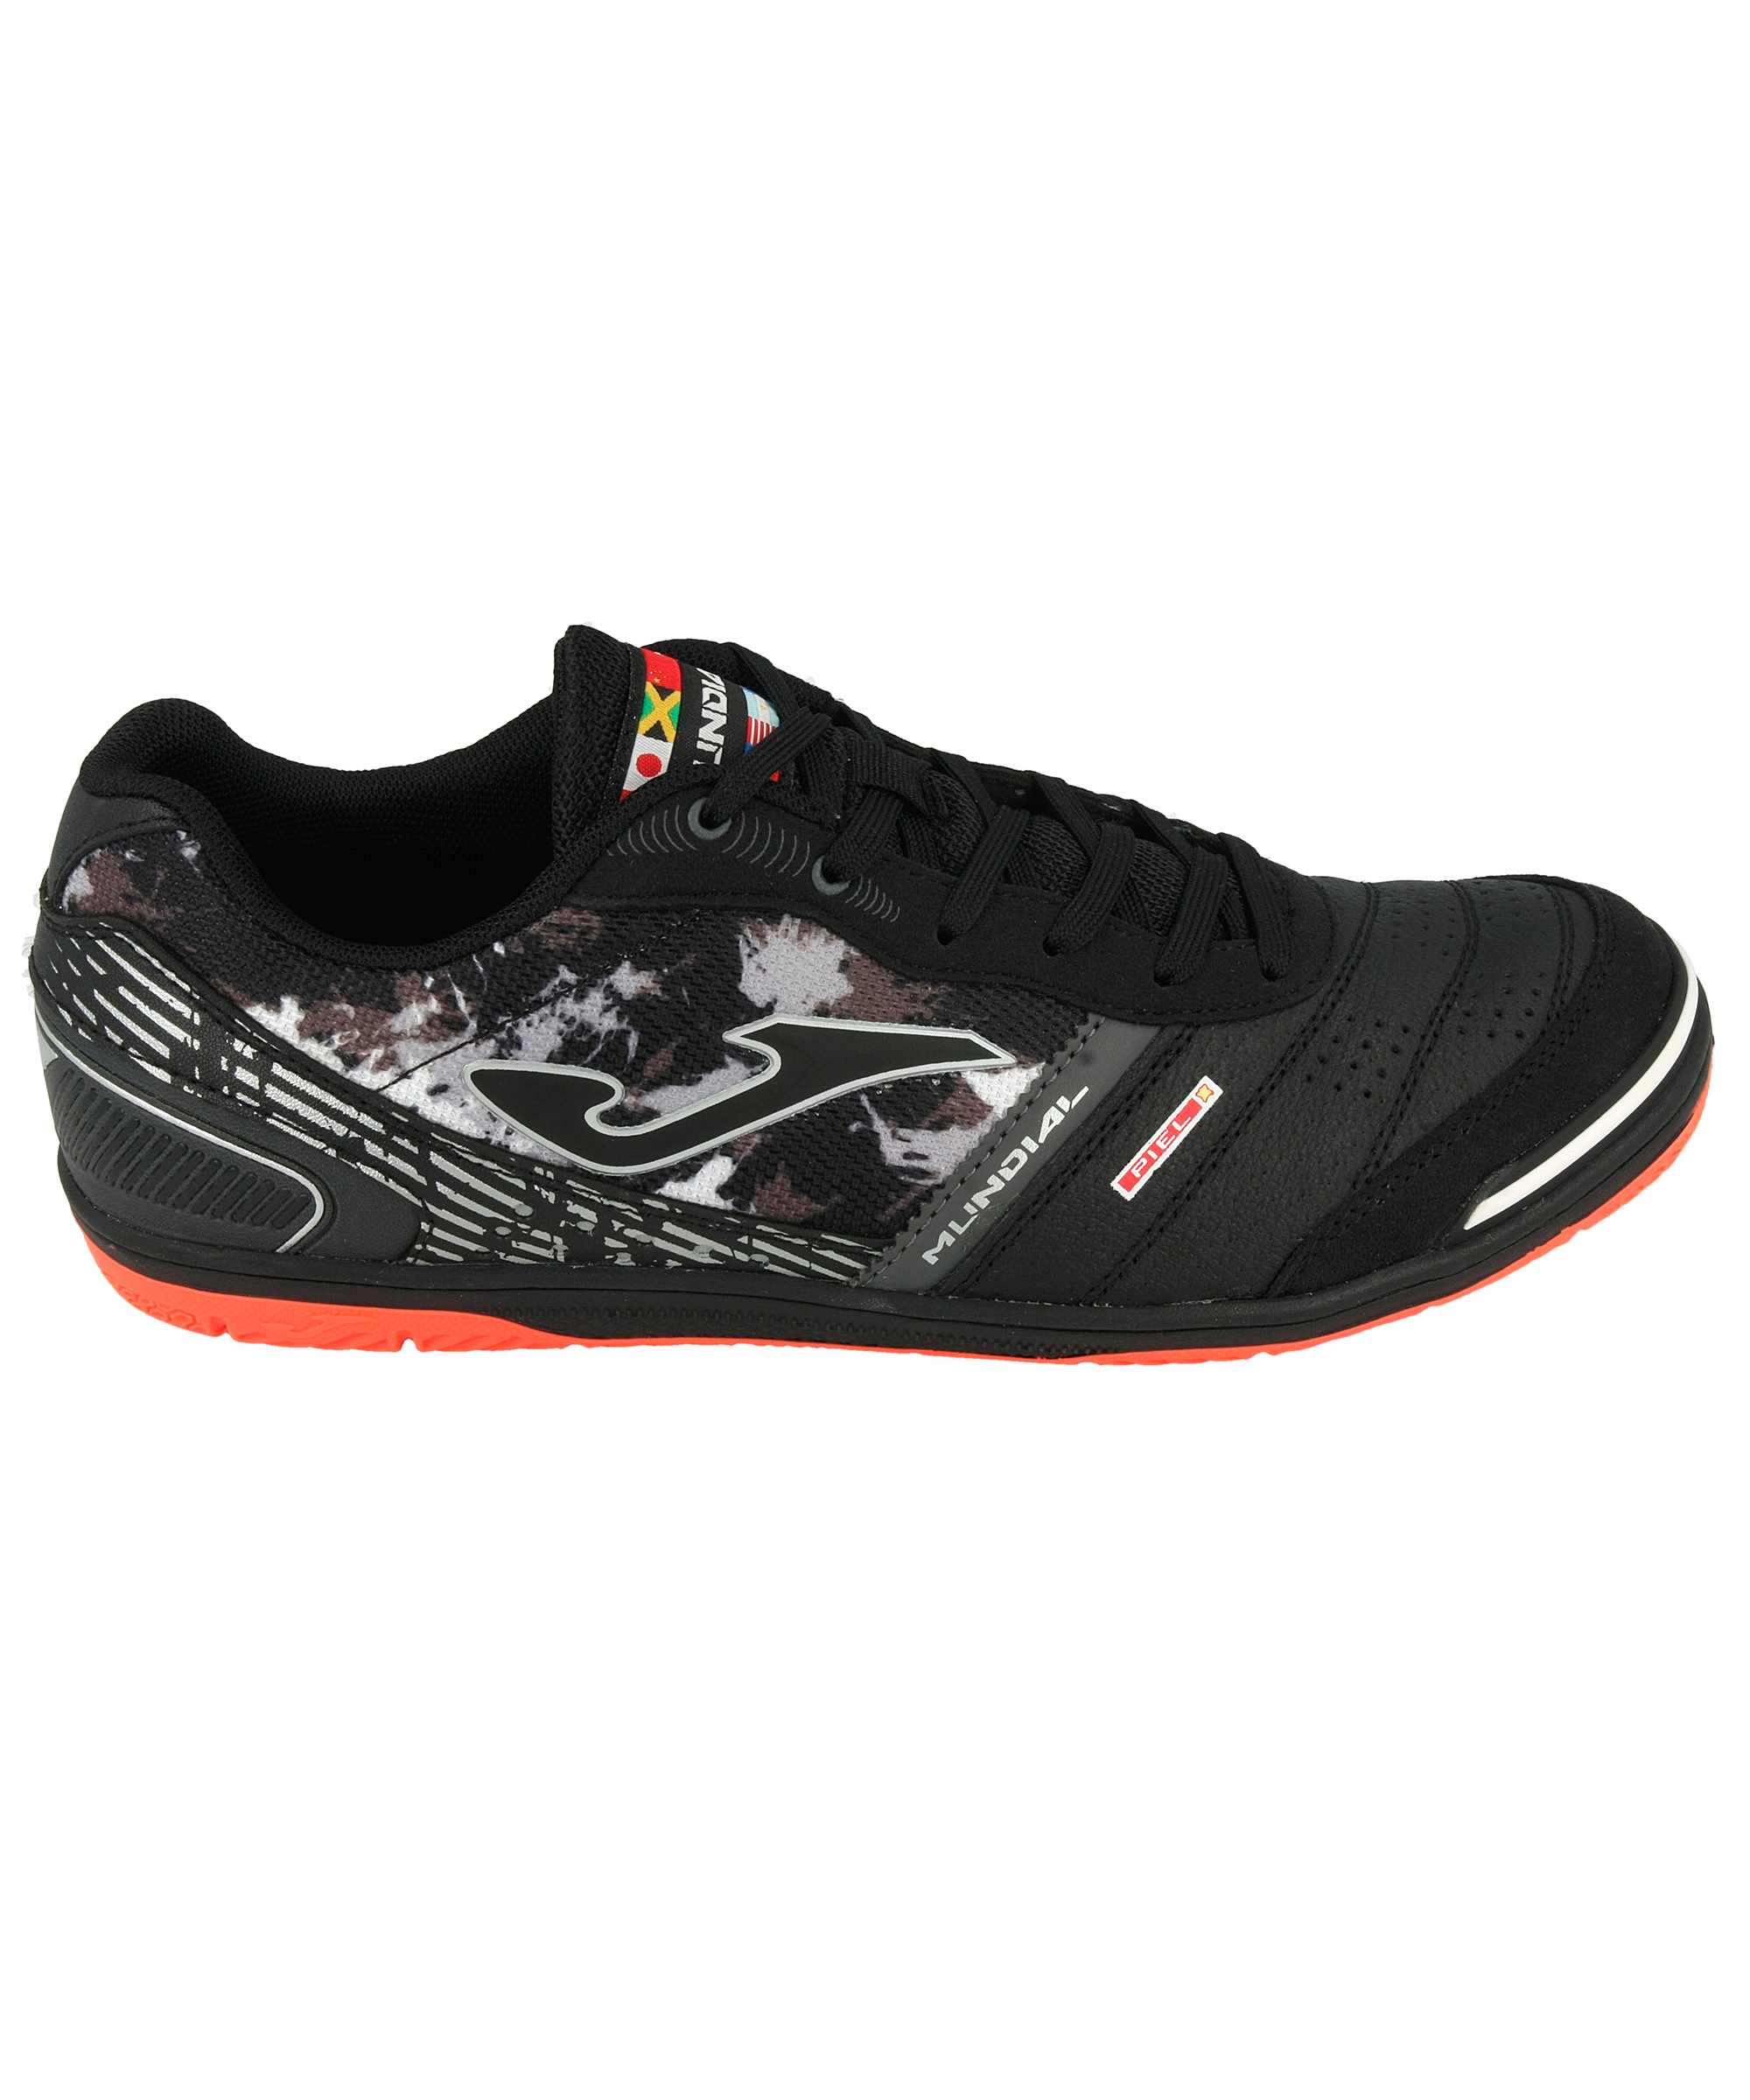 bd191649d Football shoes Joma Scarpe Calcio Mundial Nero Indoor IC Sala Futsal parquet  5 5 di 8 ...